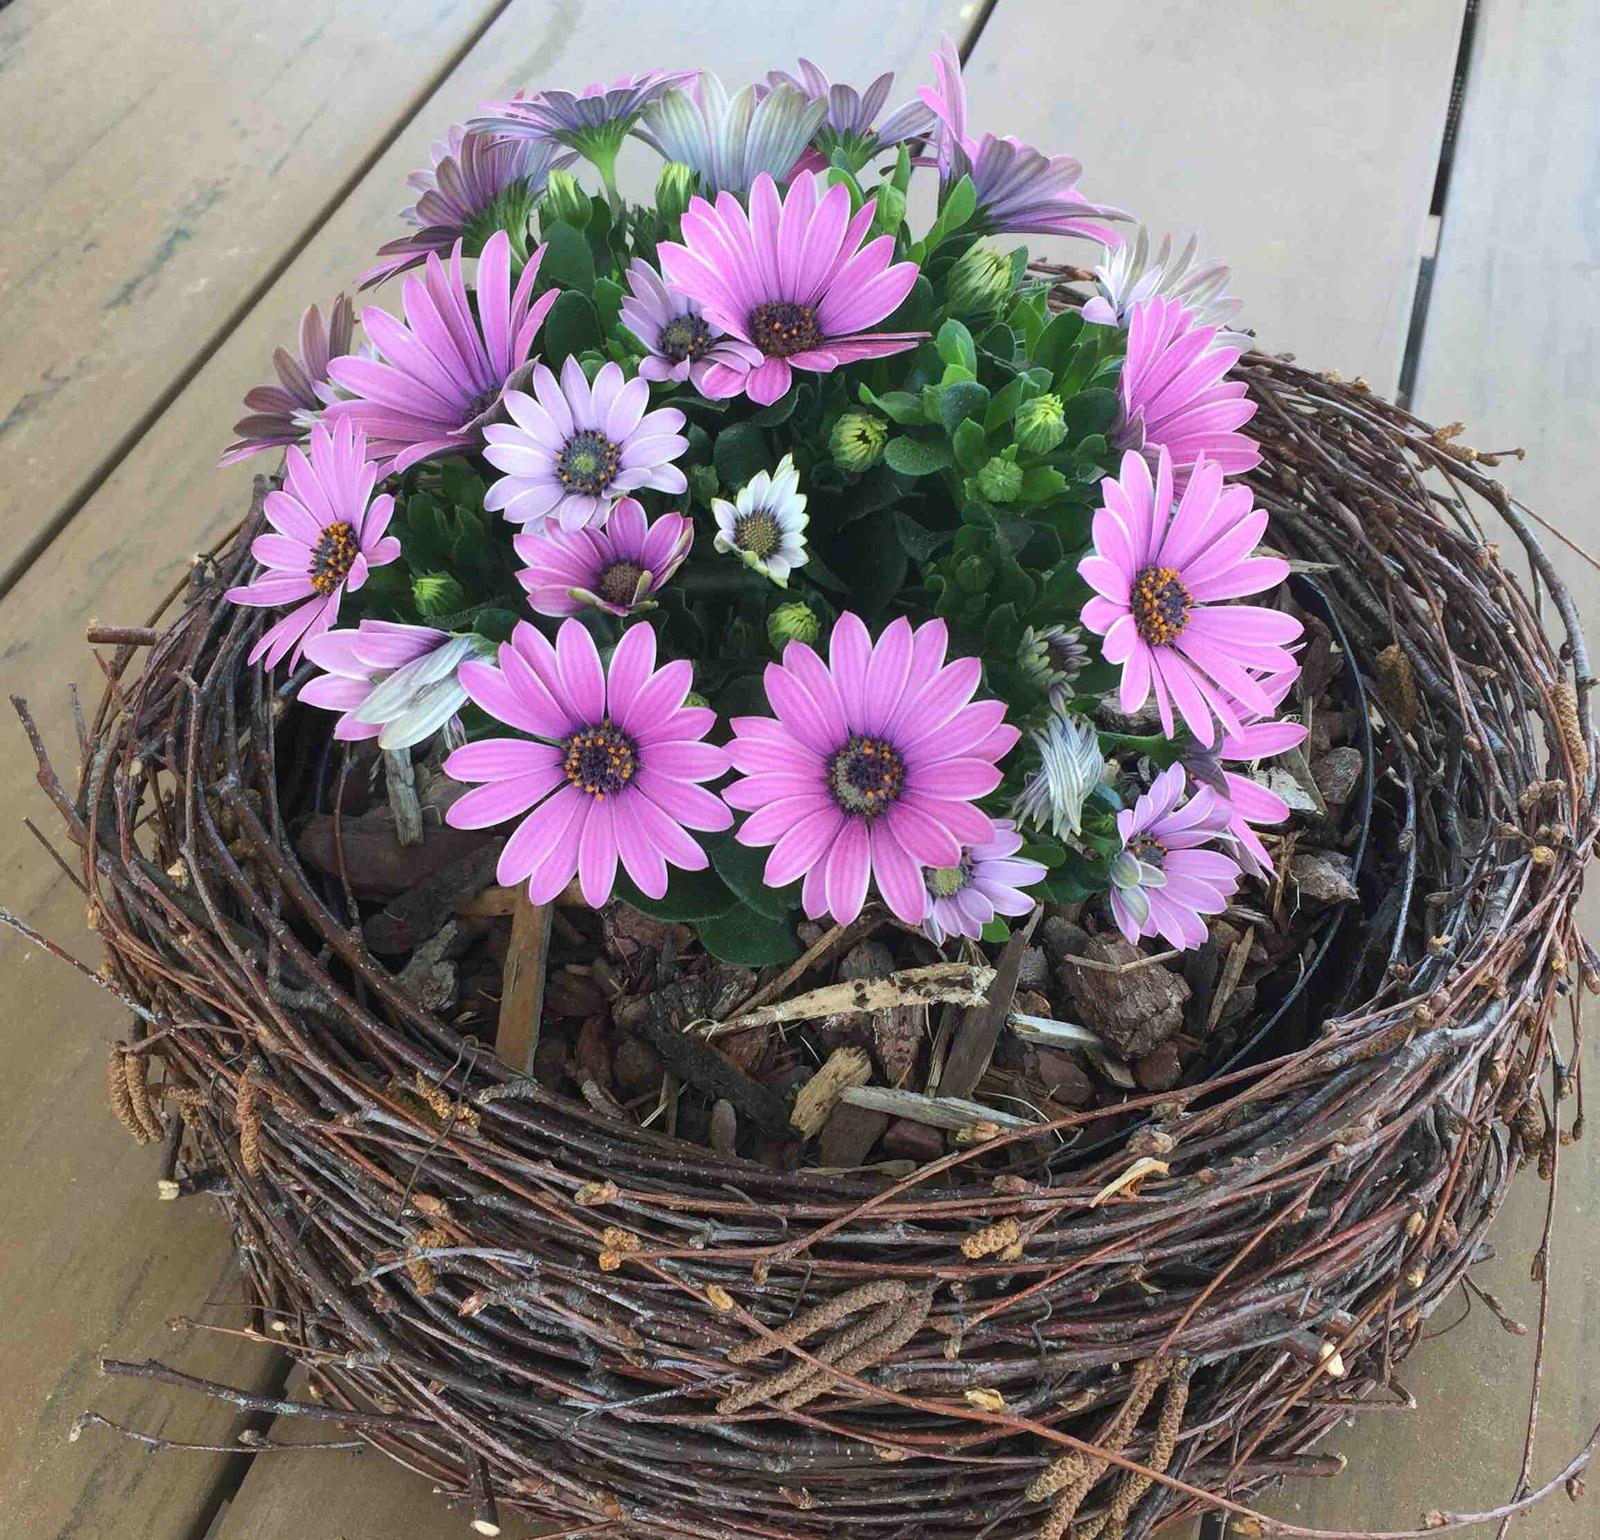 Naše barevná zahrada 🌸 - Zatím kvete krásně 🤗